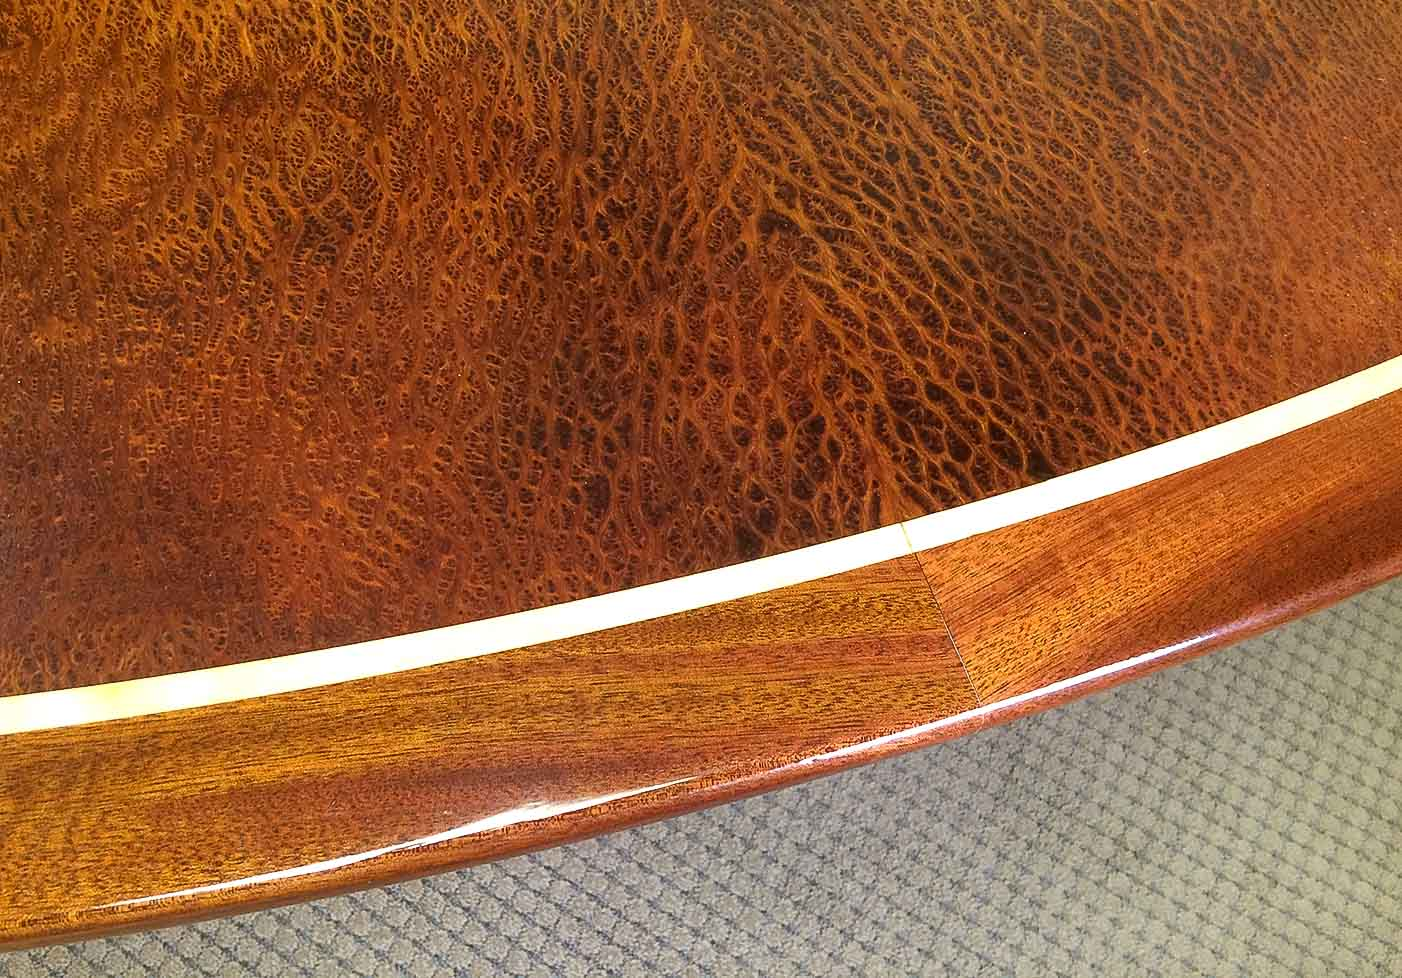 Boardrooms and Reception Desks in Walnut burr or Birds-eye maple